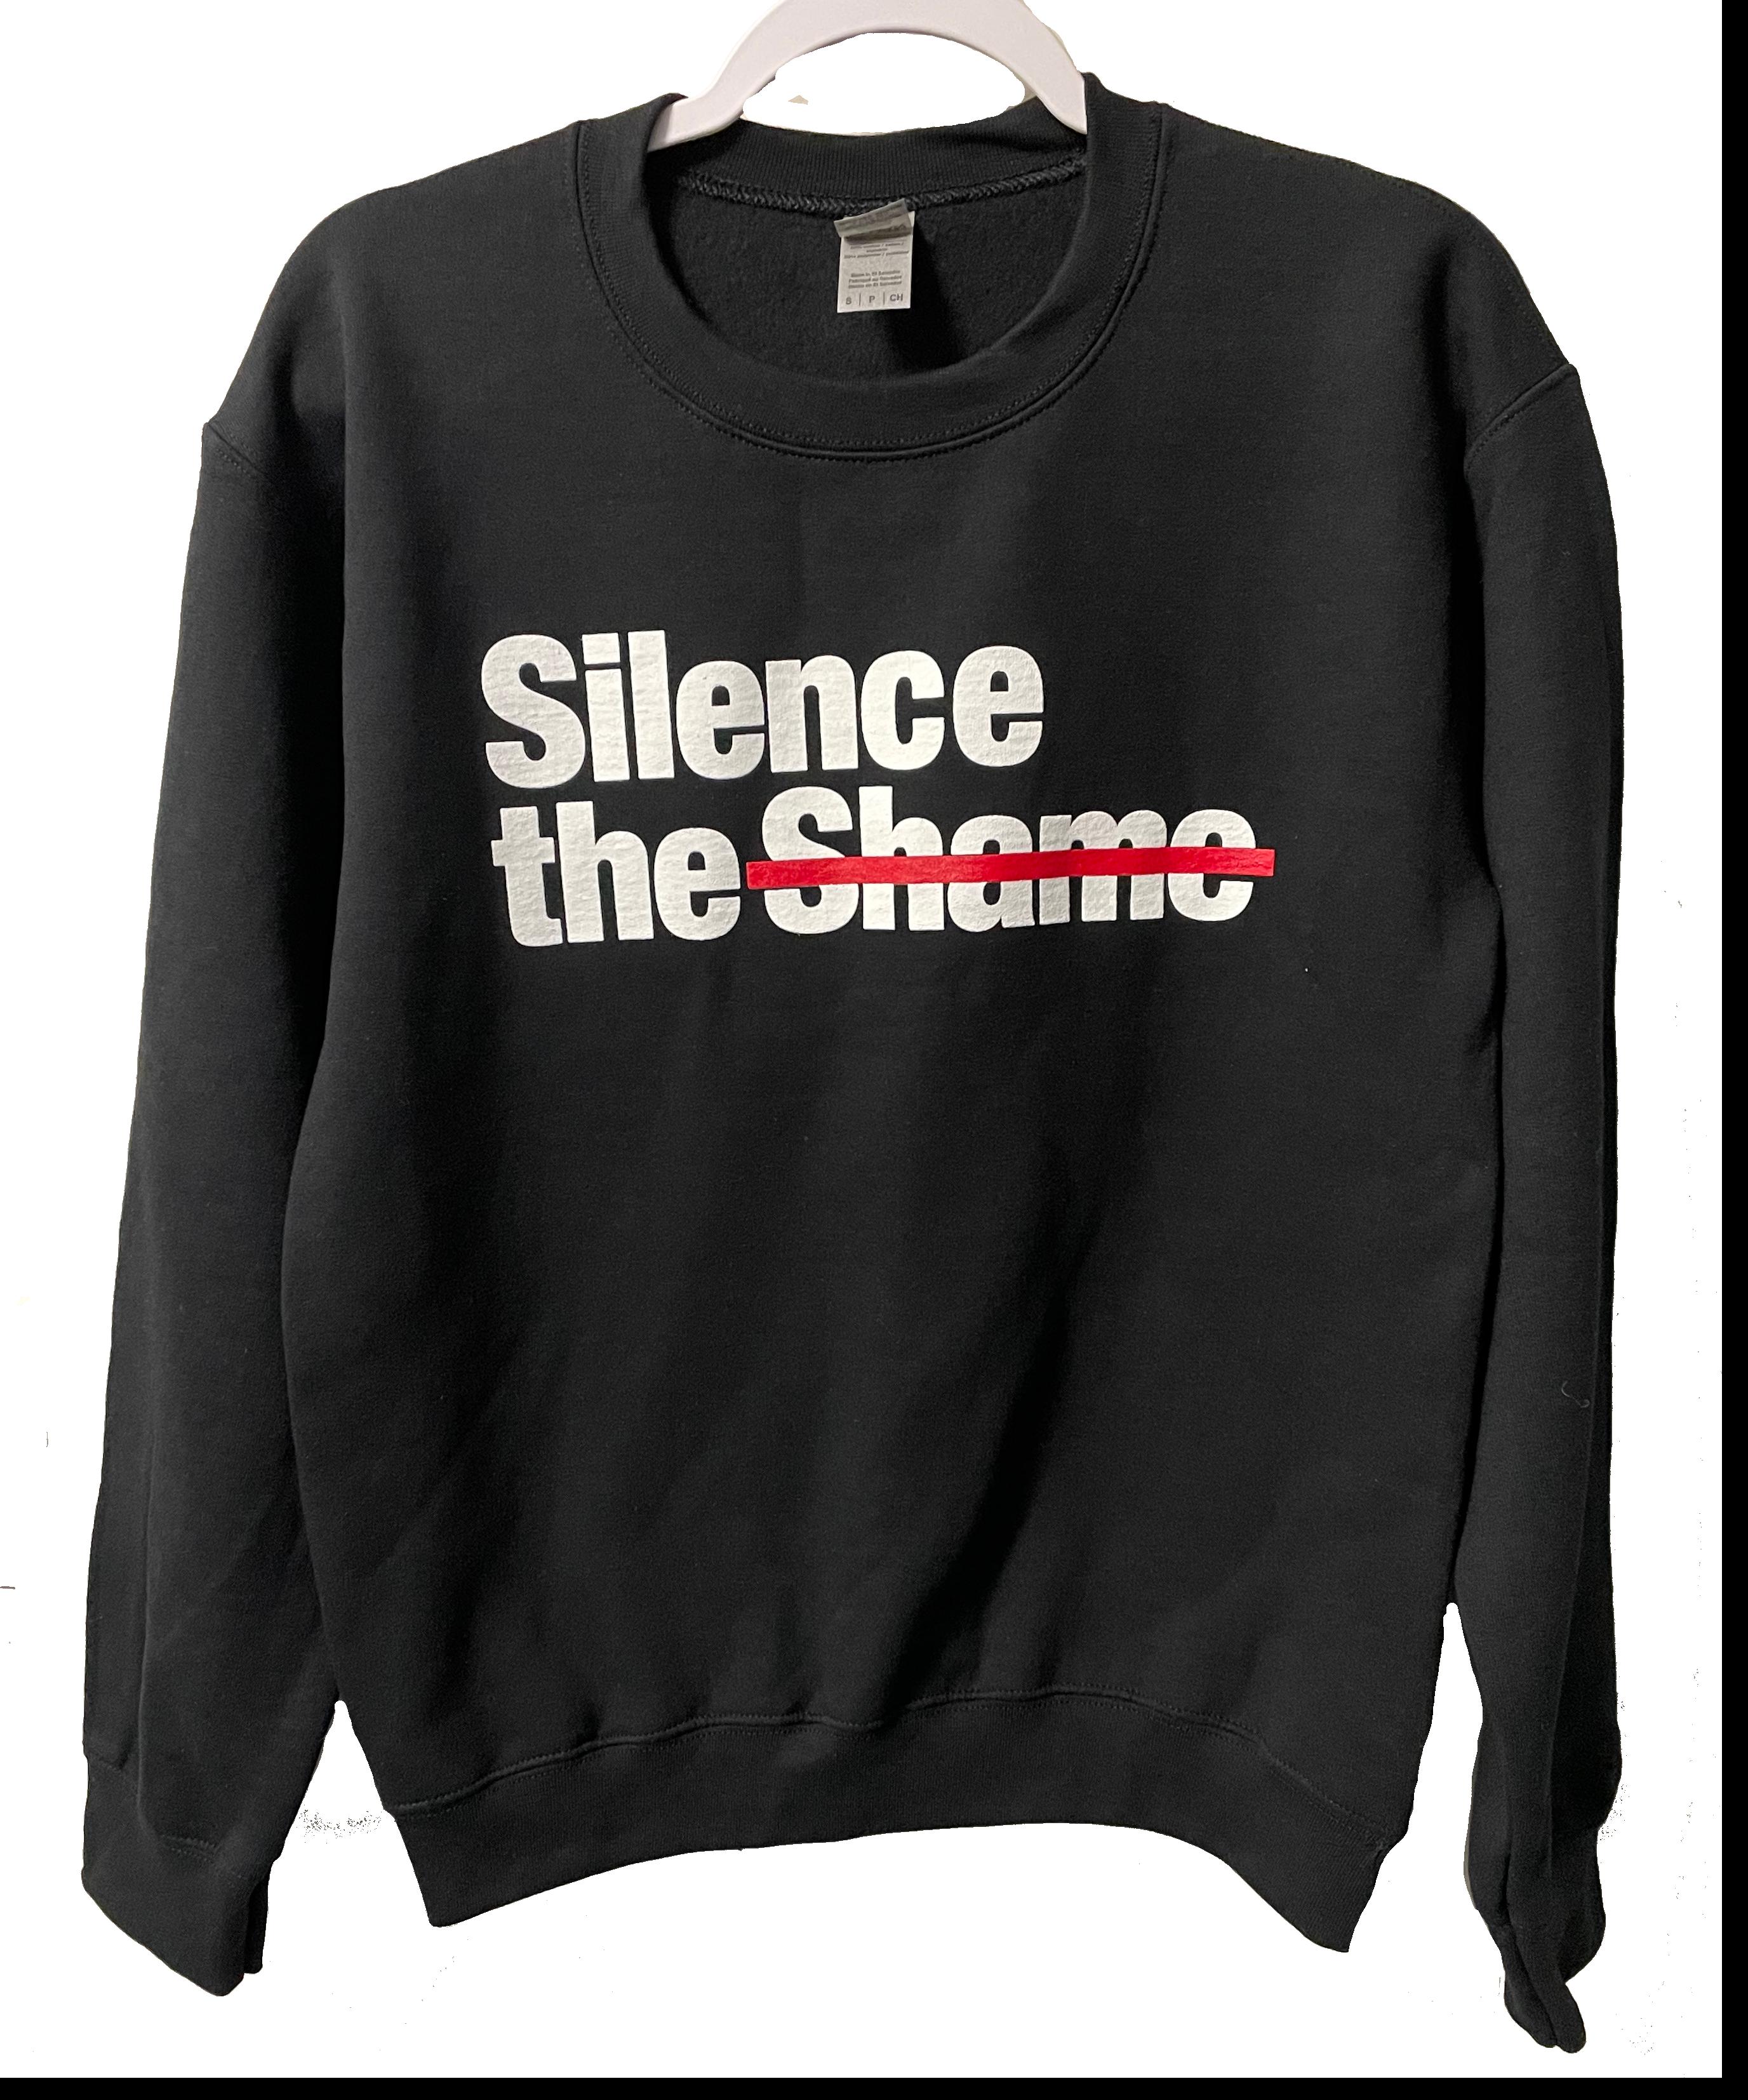 Silence the Shame Signature Black Crewneck Sweatshirt 3XL